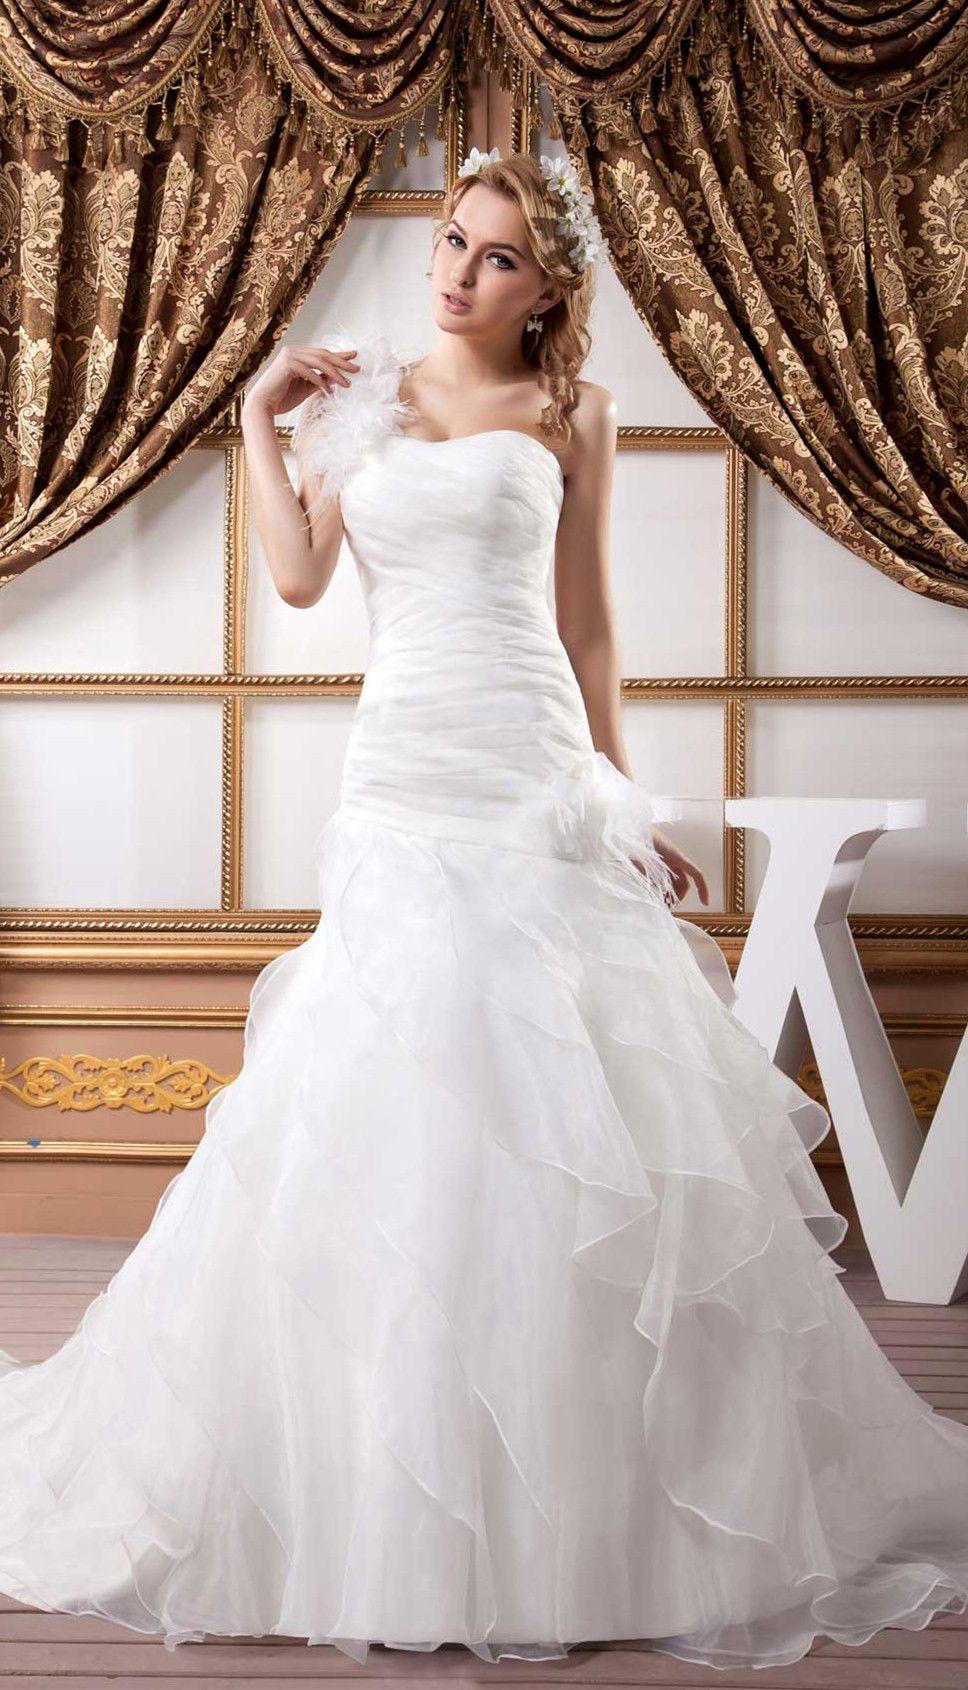 White Tier Chapel Train Chiffon Sleeveless Wedding Dress